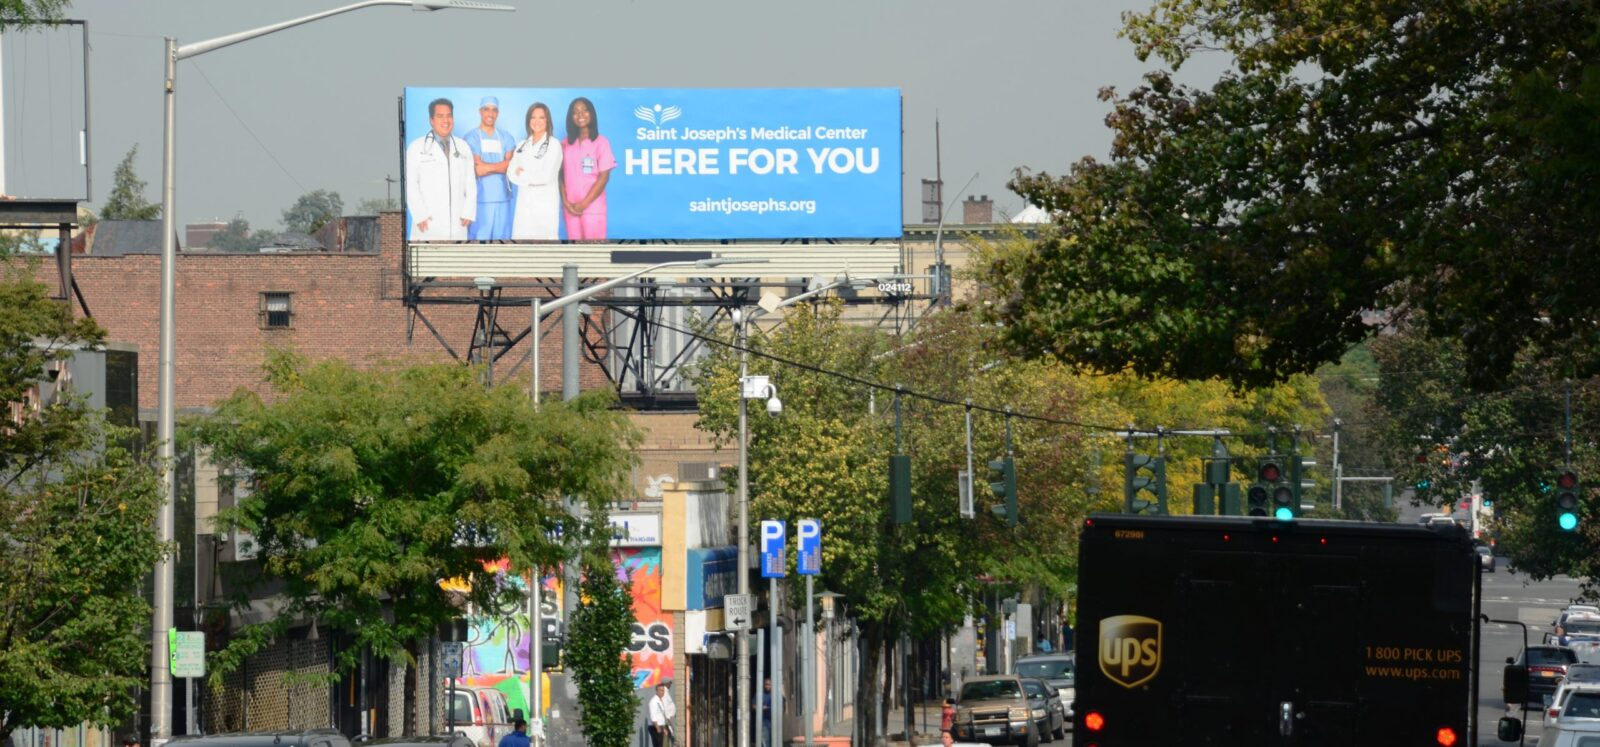 St Joseph Hospital Billboard Advertising